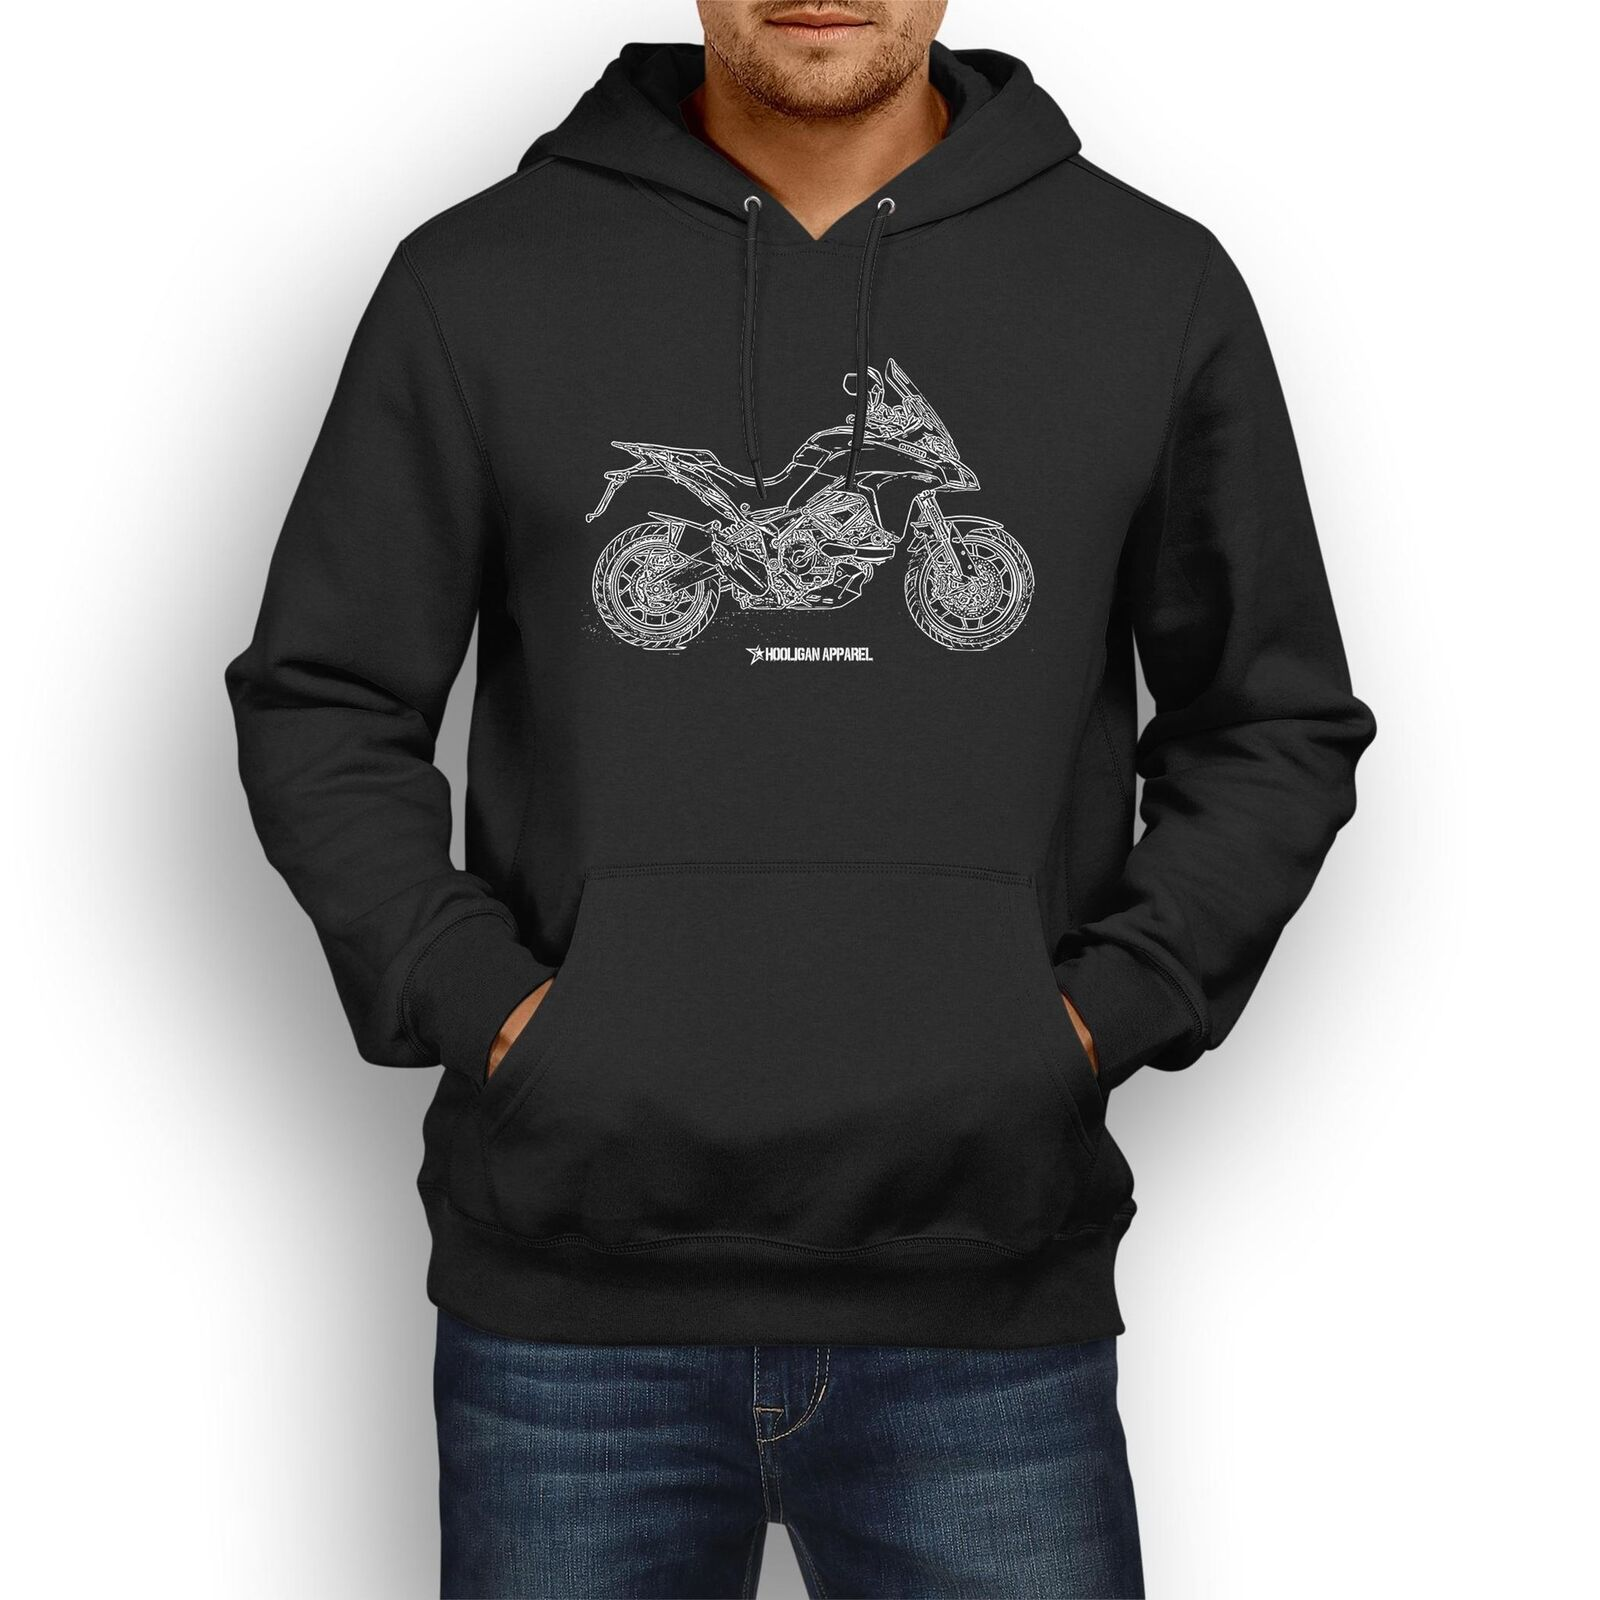 Ducati Multistrada 950 2017 InspiROT Motorcycle Art Men's Hoodie